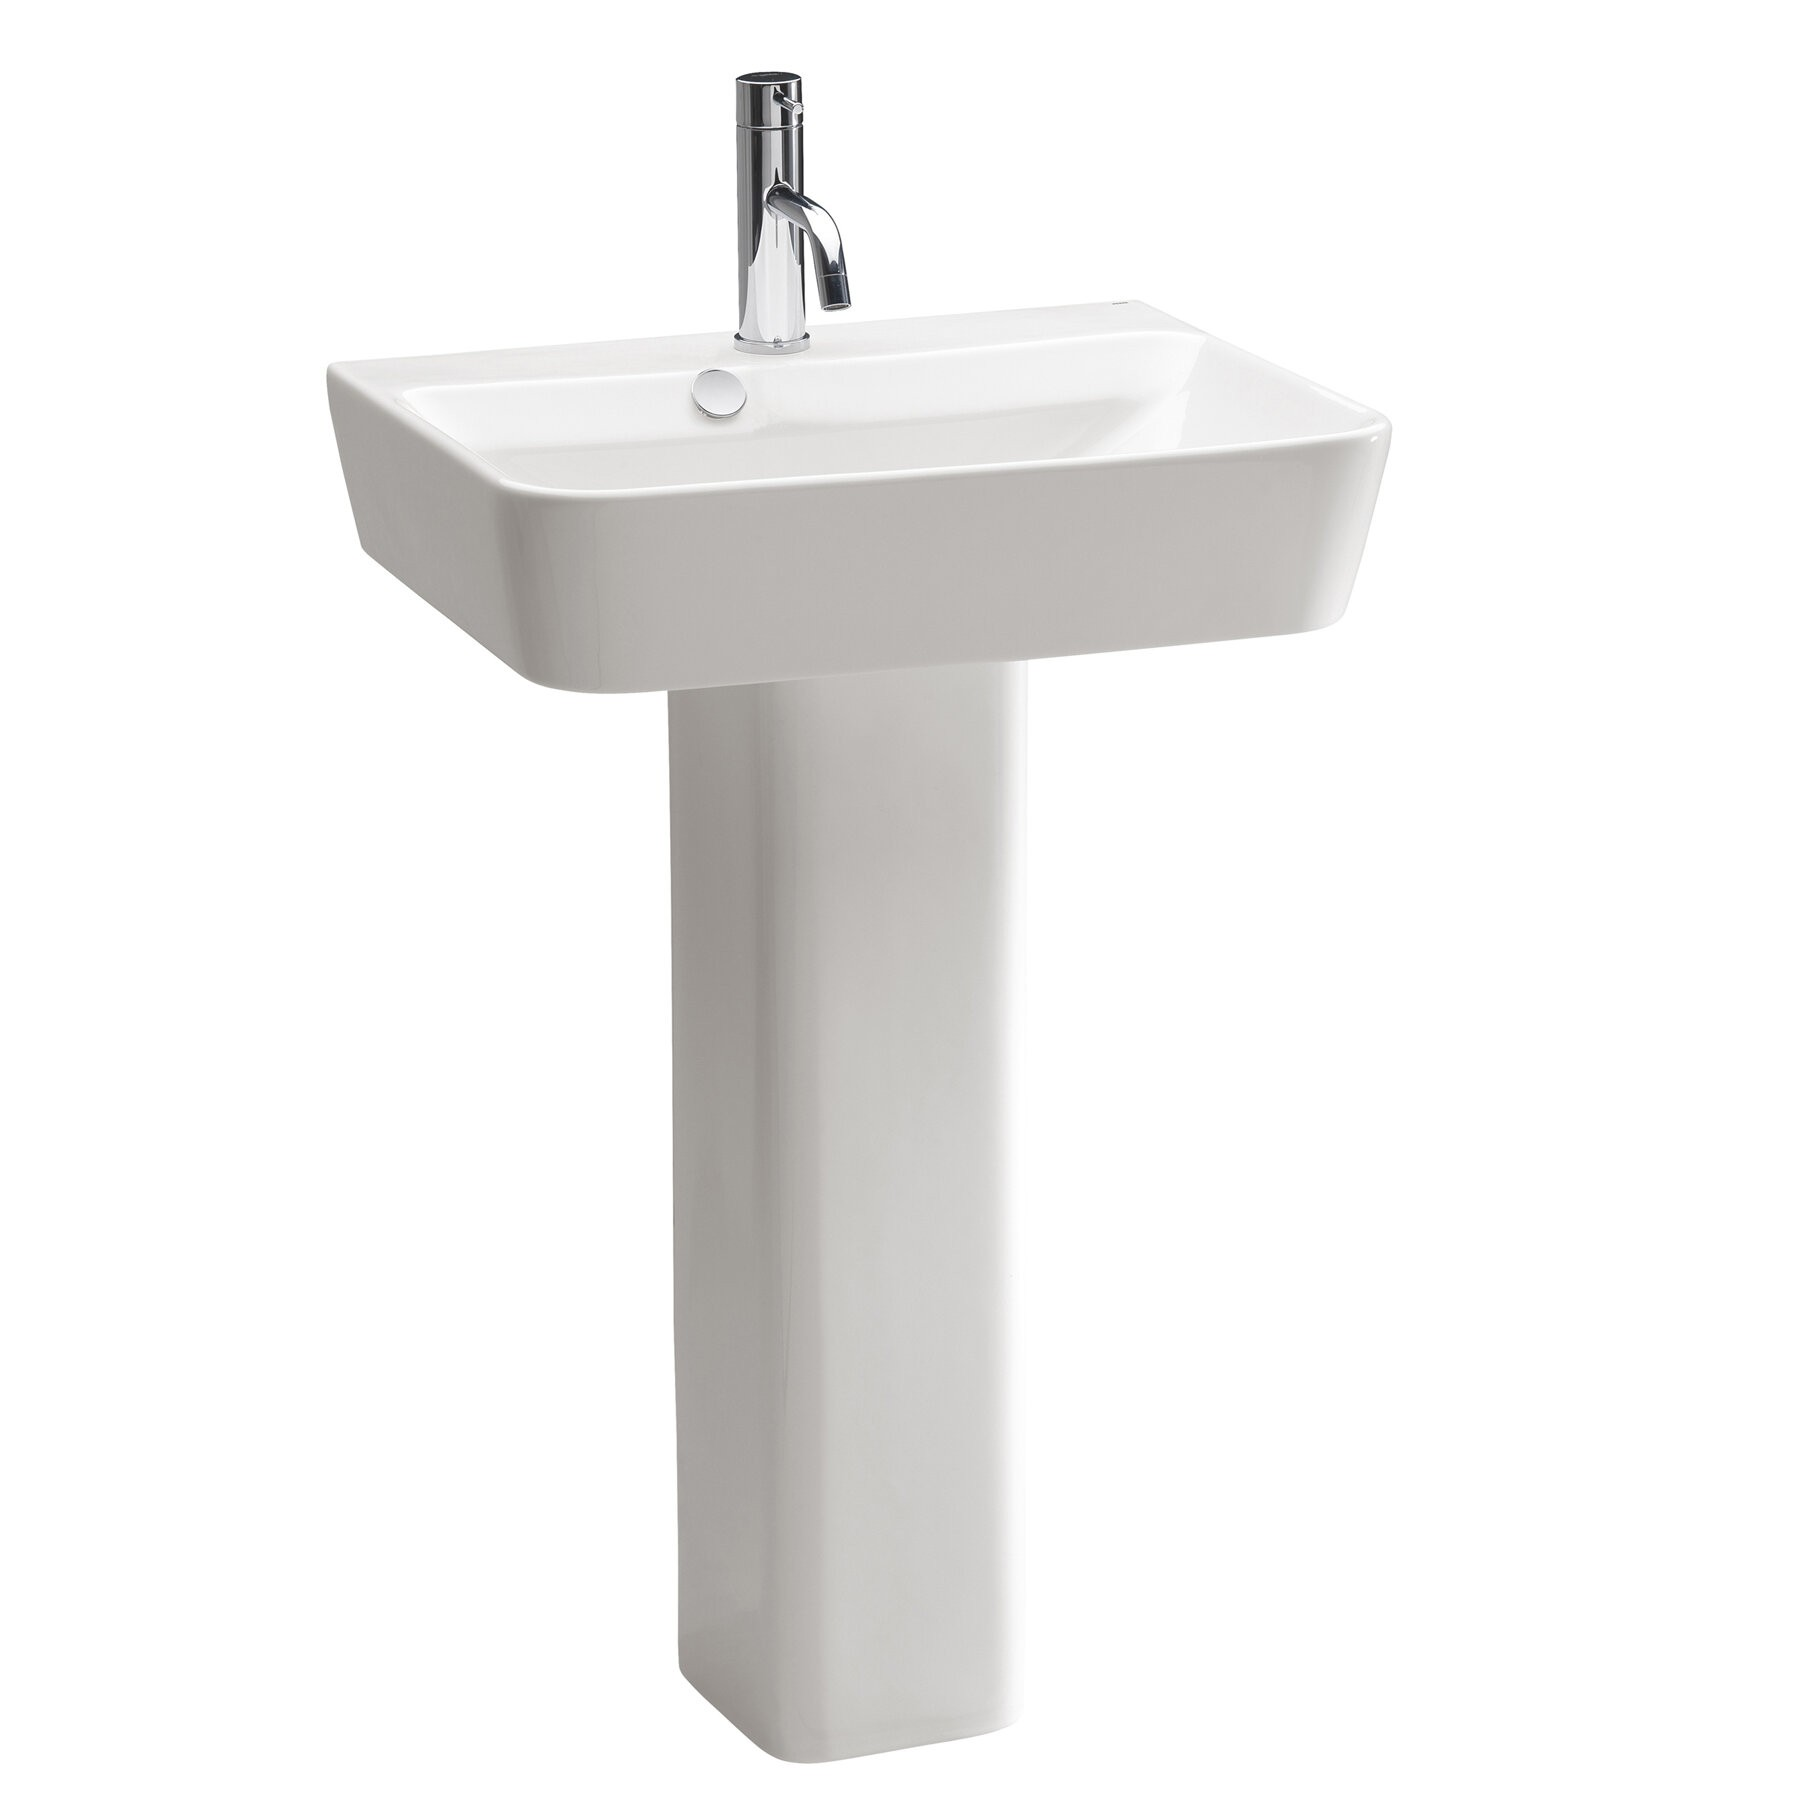 Exceptional Emma Pedestal Bathroom Sink